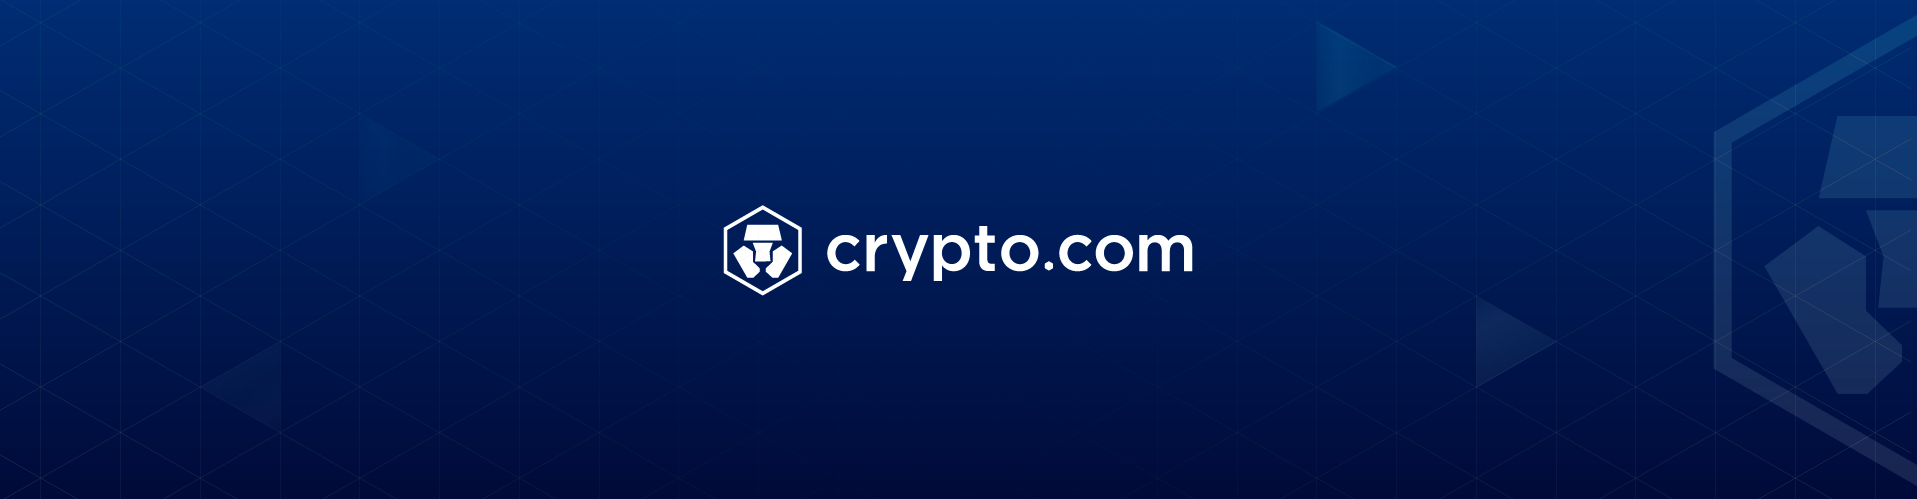 Crypto.com Updates